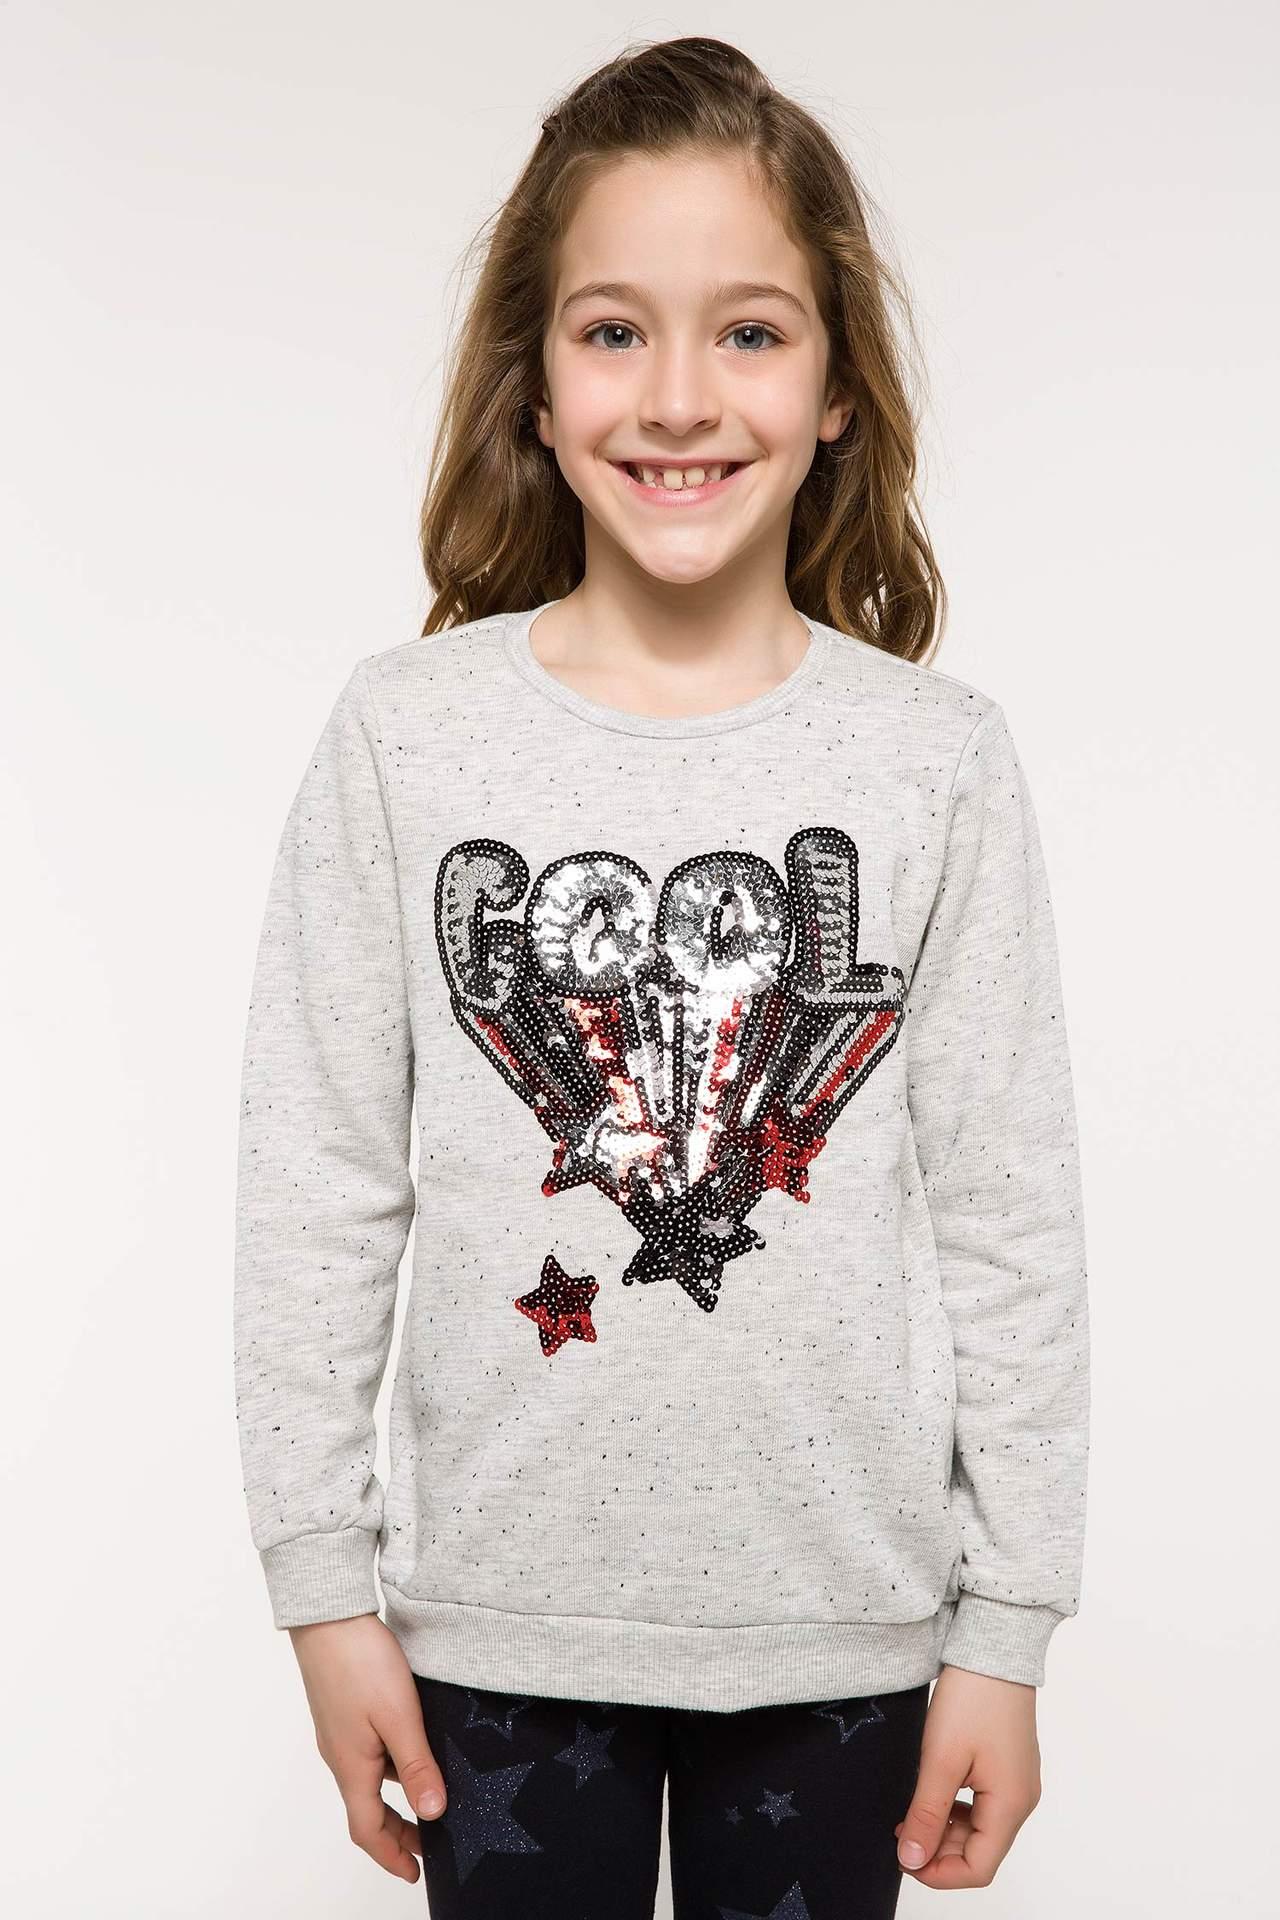 DeFacto Kız Çocuk Payet Detaylı Çift Taraflı Sweatshirt Gri female